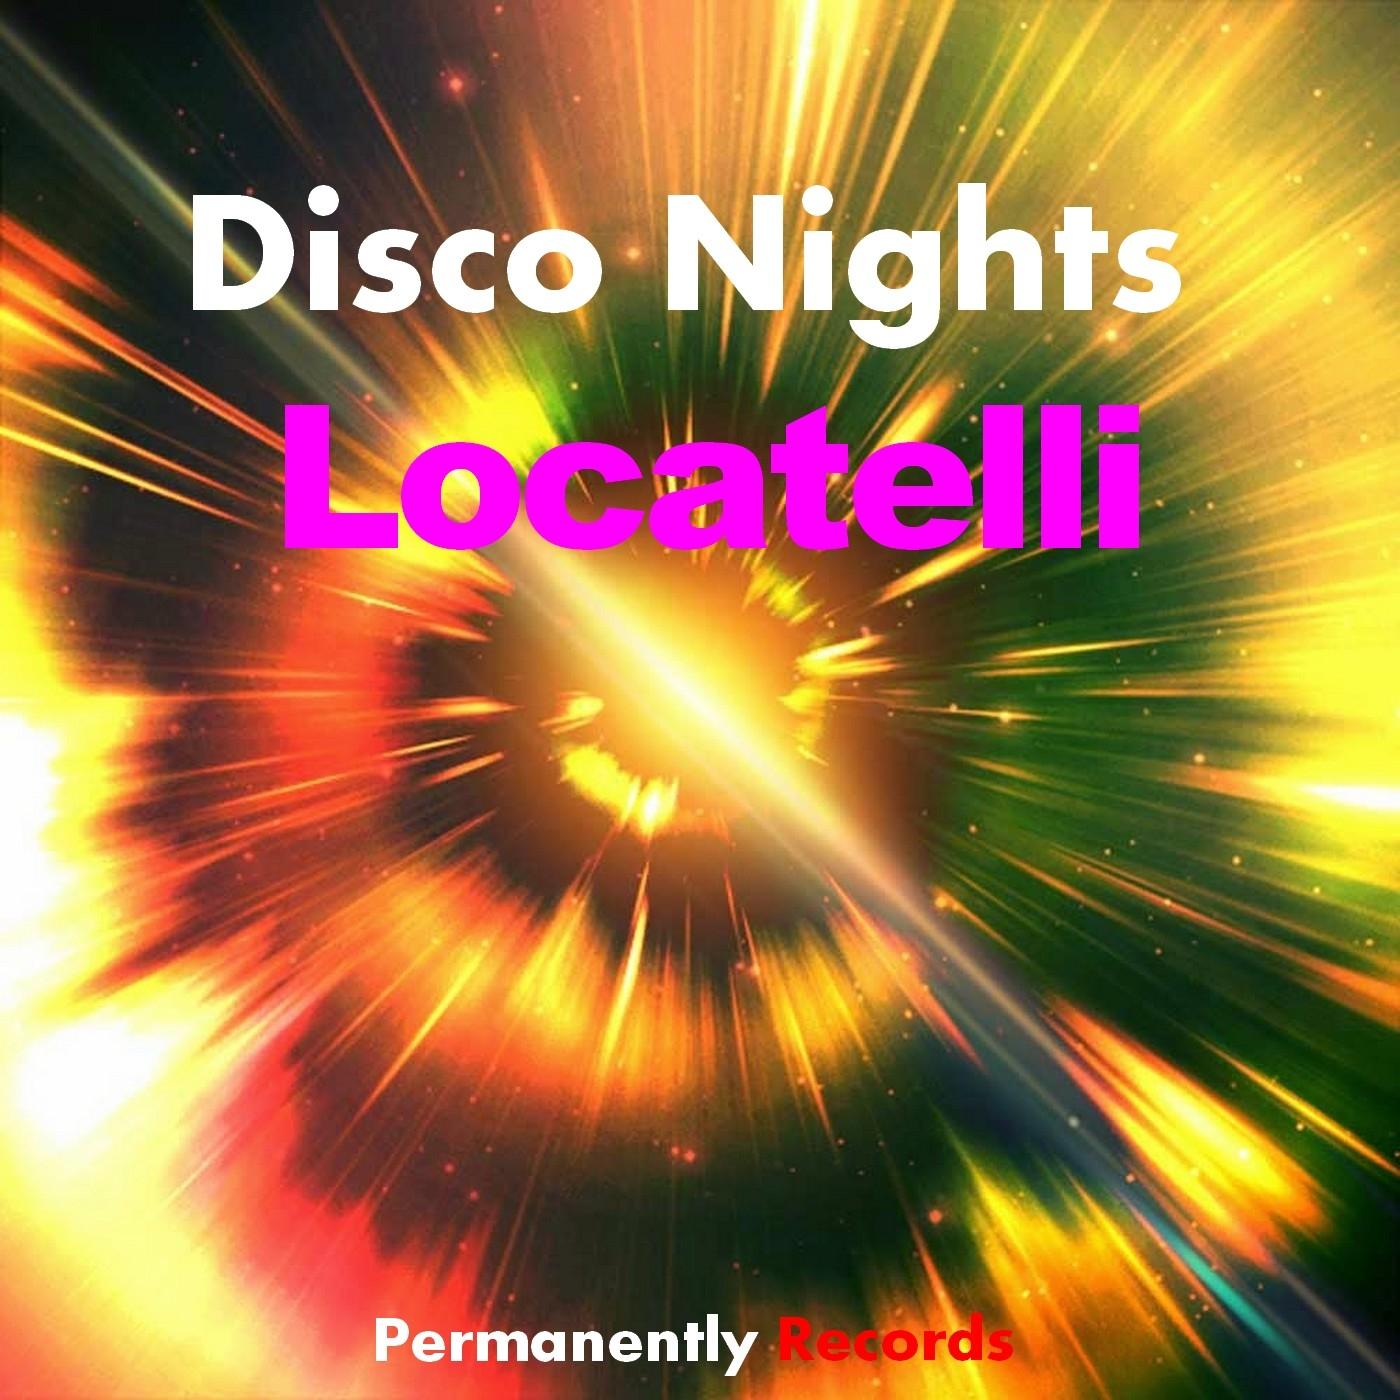 Locatelli - Disco Nights (Edit mix)